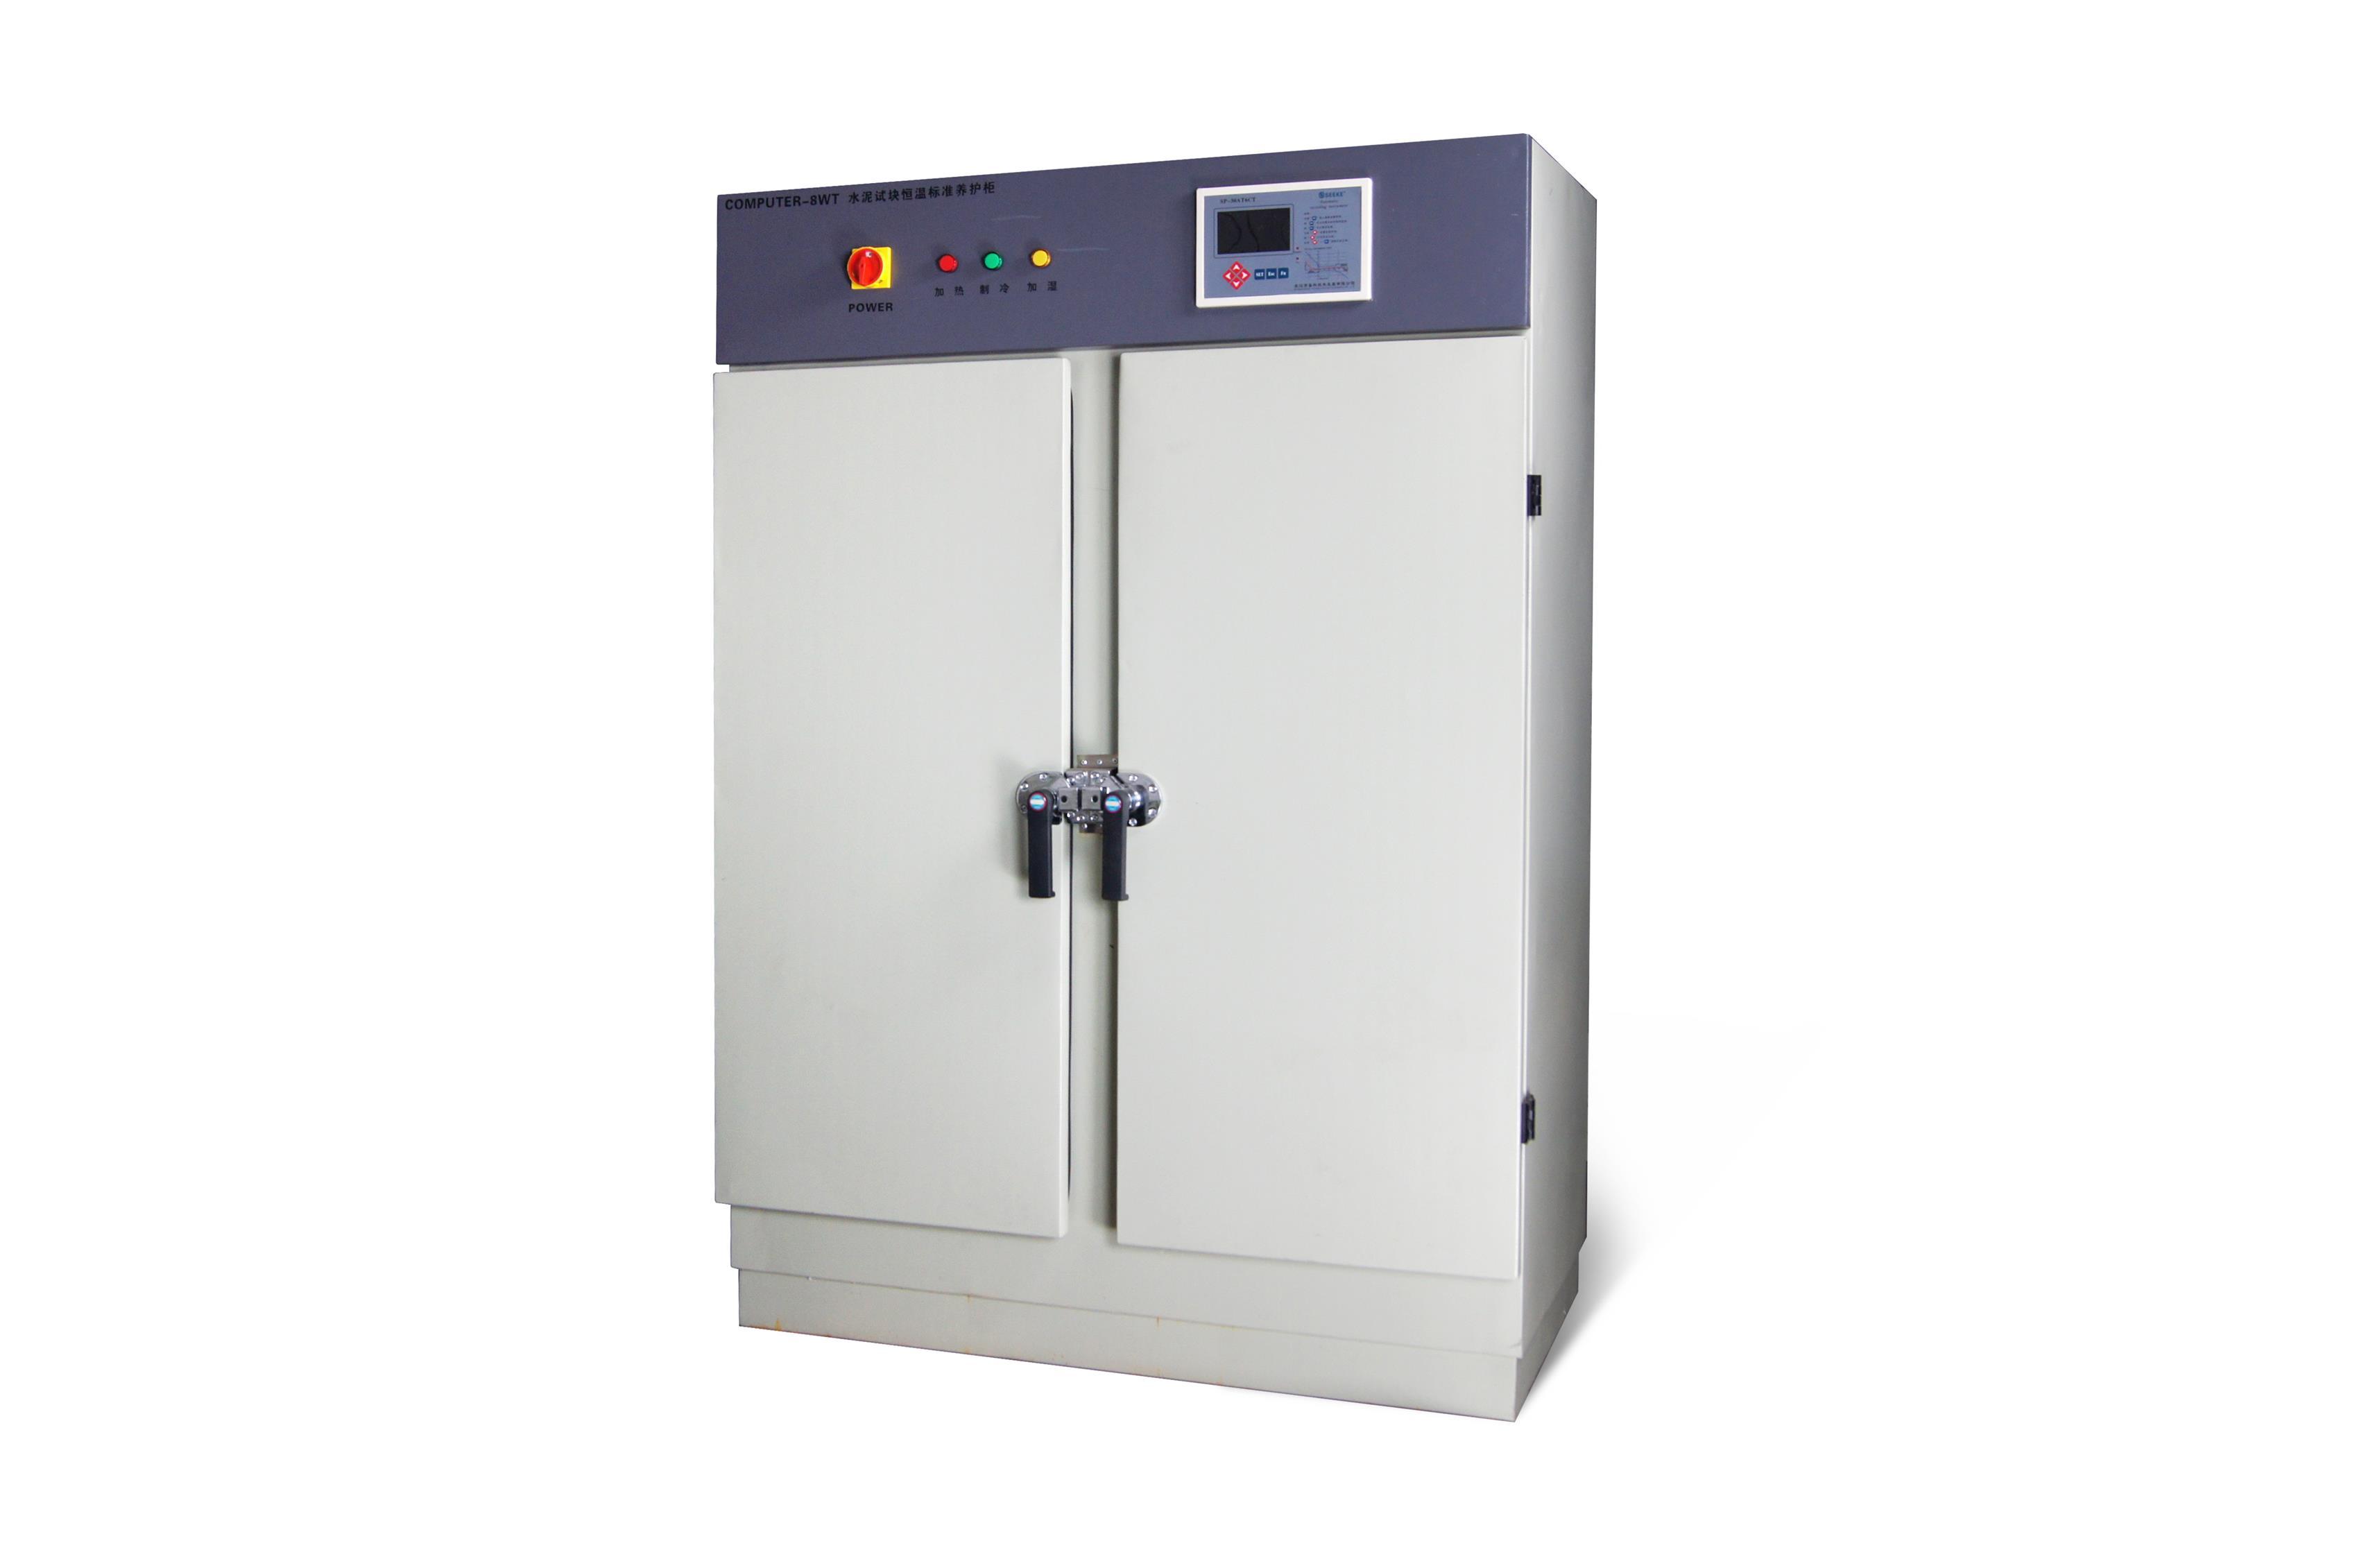 COMPUTER-8WT 水泥试块恒温标准养护箱